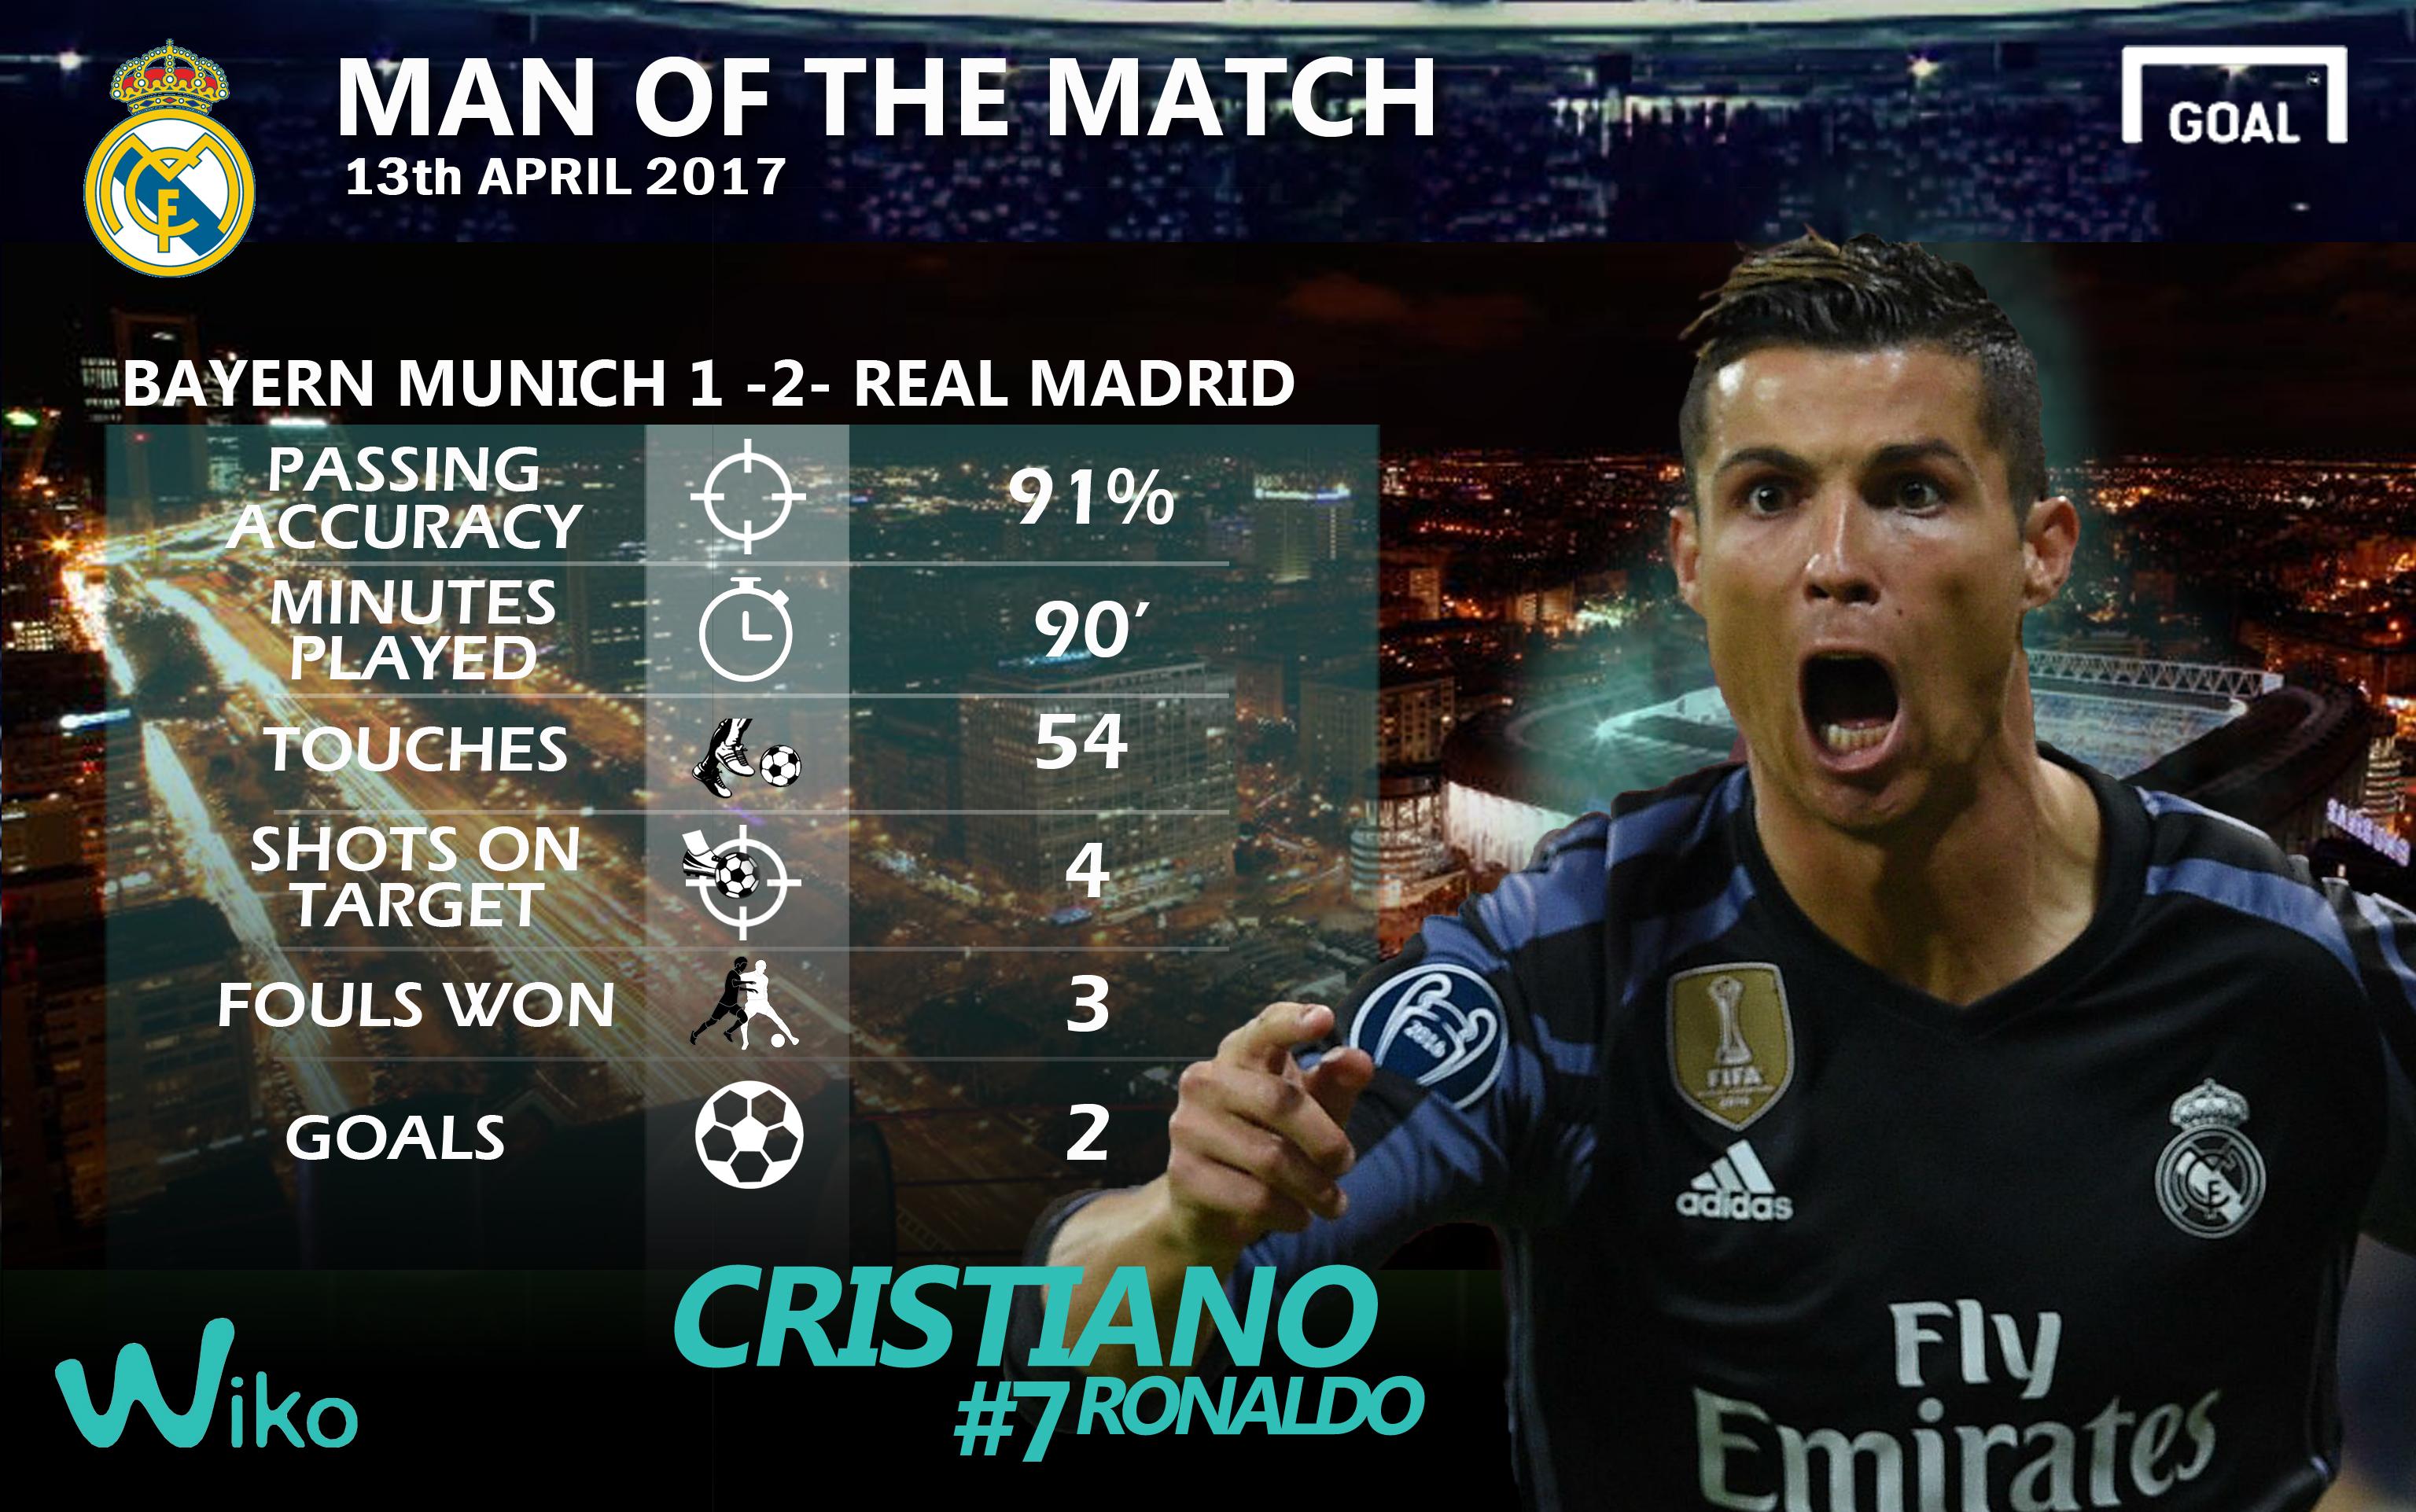 Cristiano Ronaldo Wiko game changer